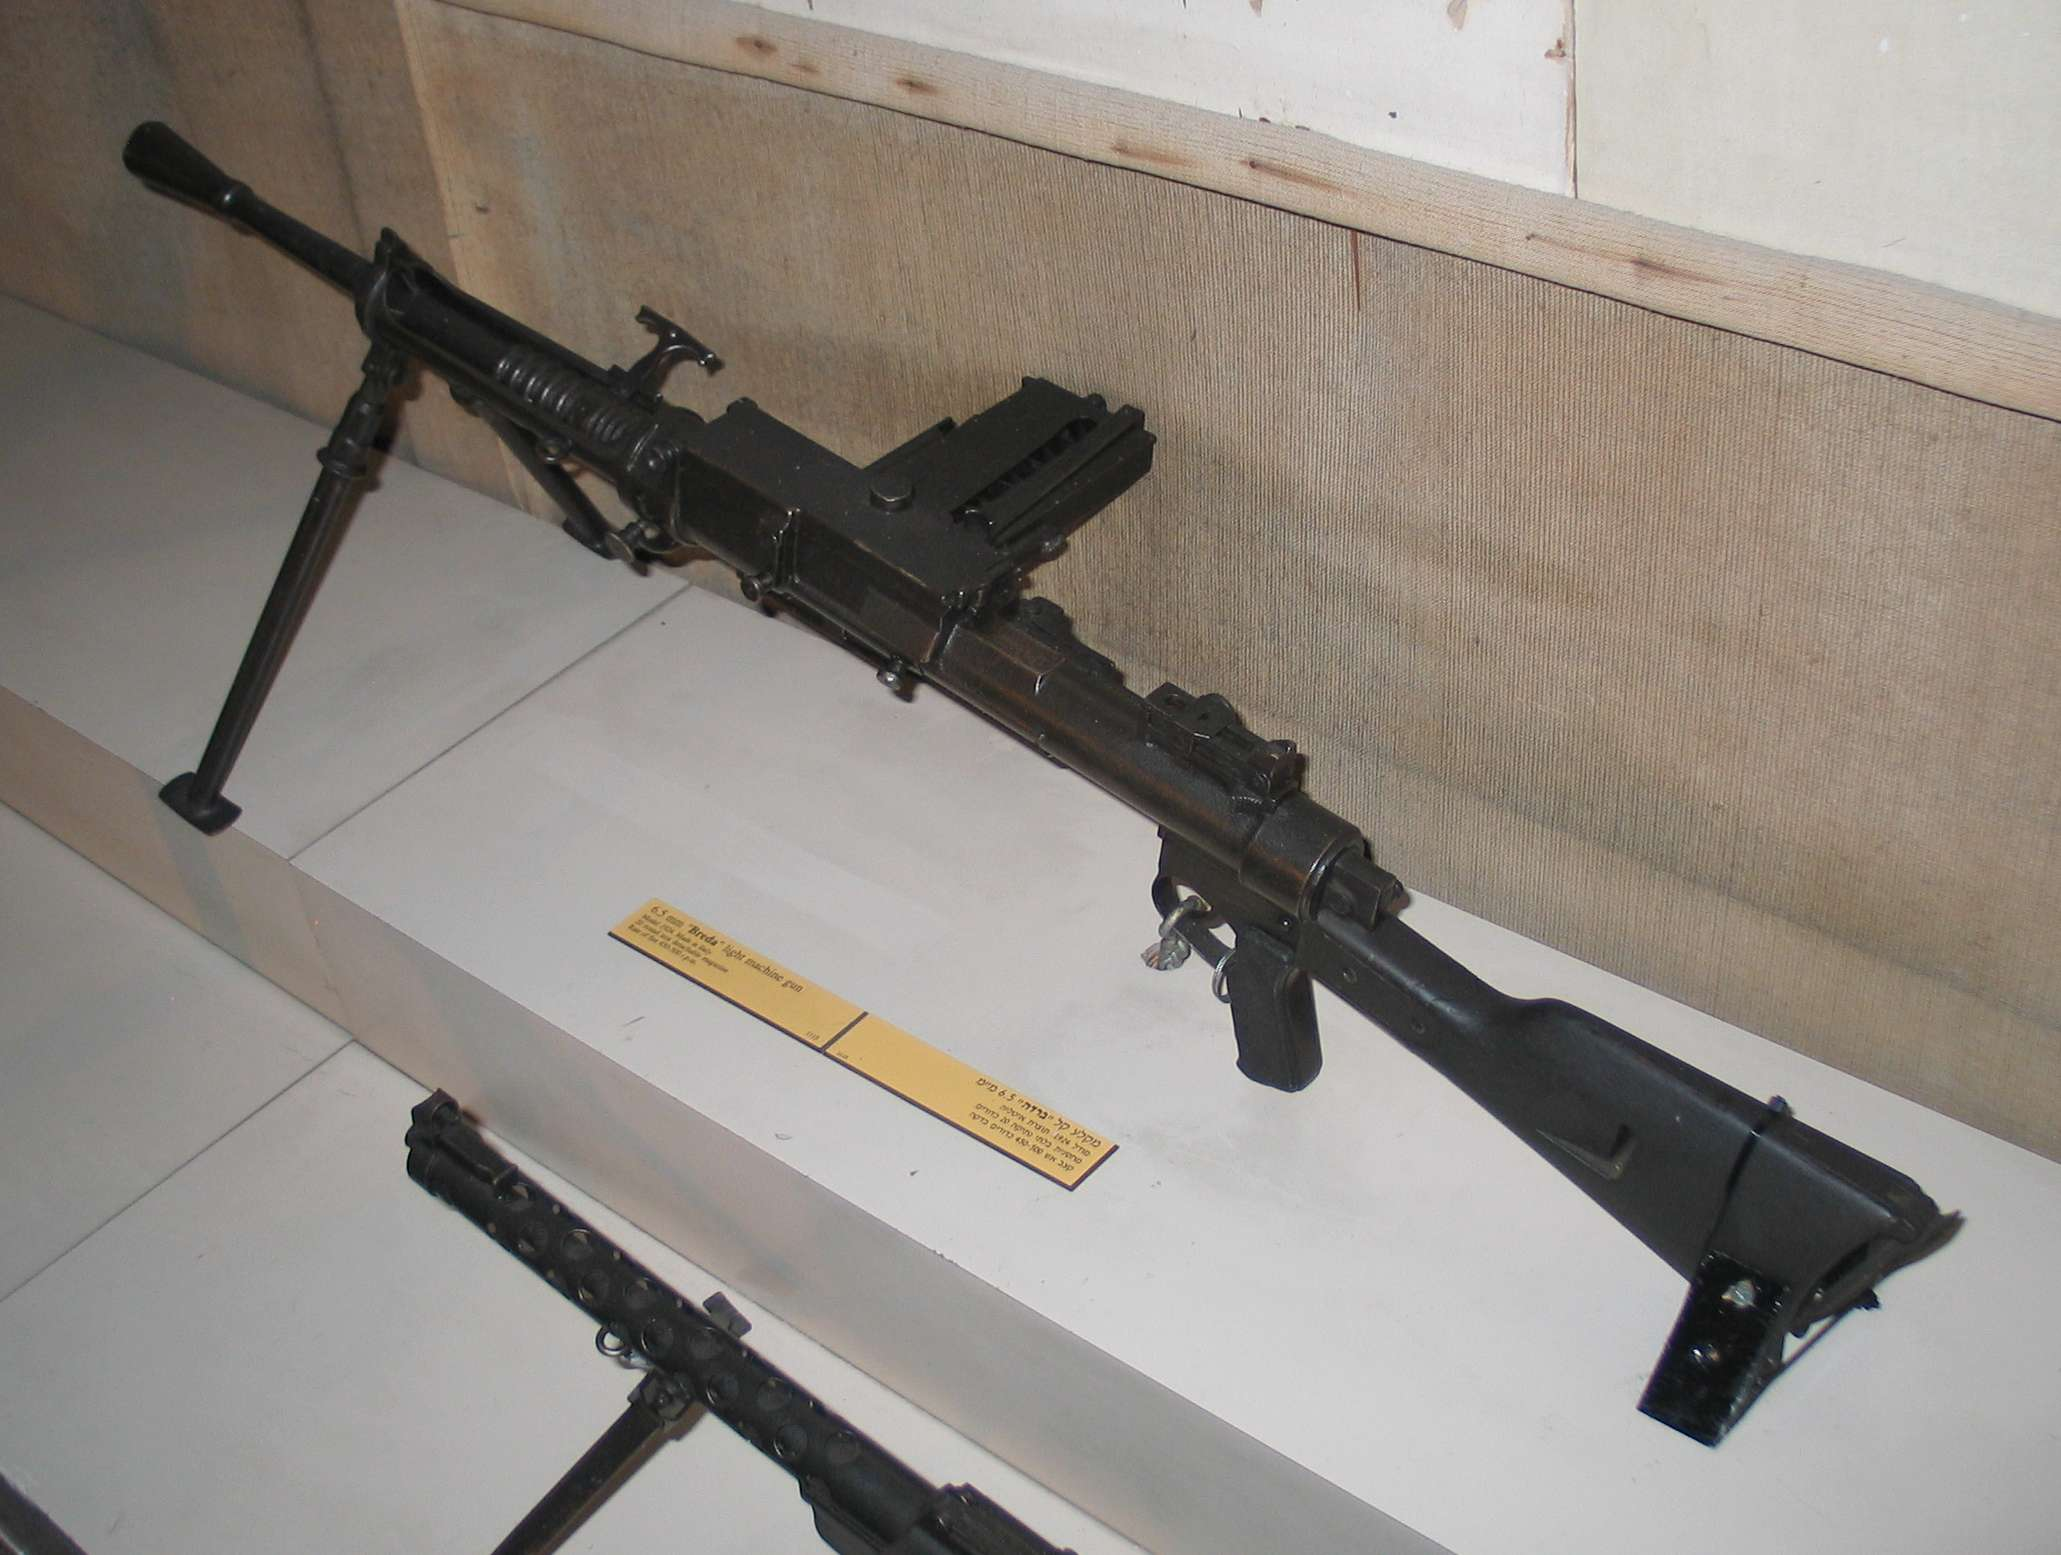 File:Breda-M1924-light-machine-gun-batey-haosef-1 jpg - Wikimedia